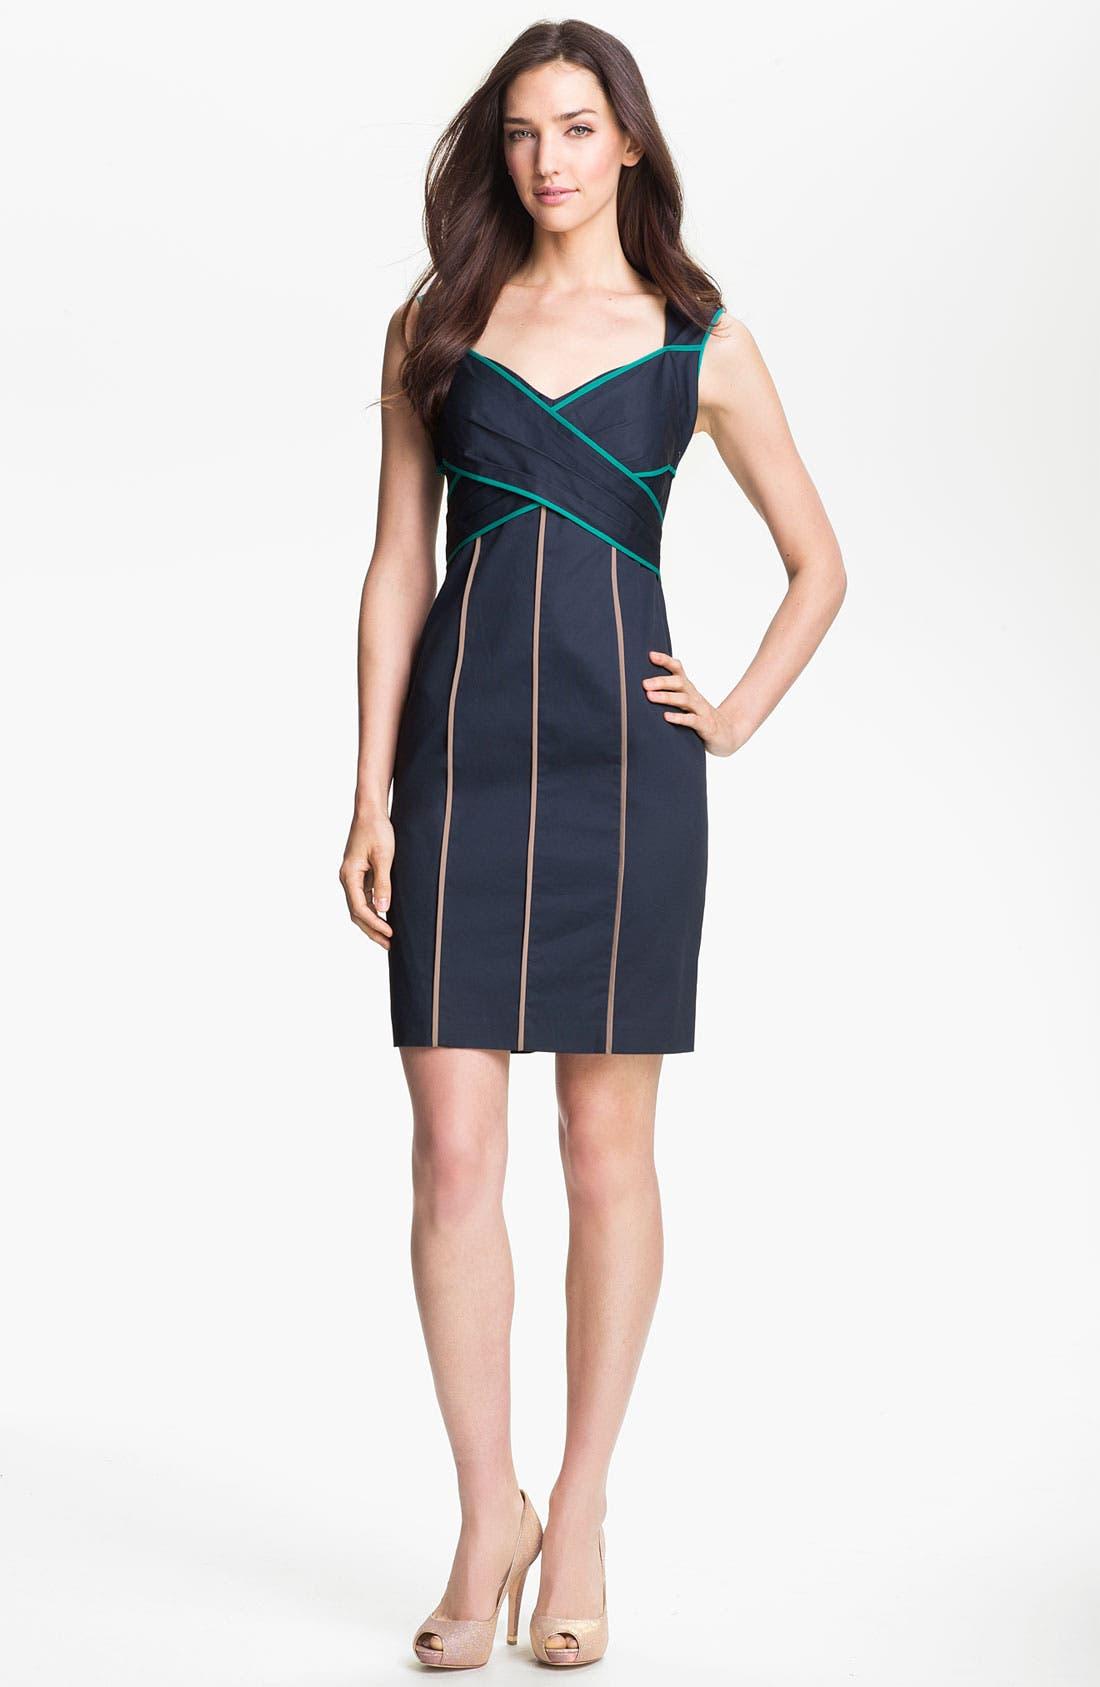 Main Image - Jessica Simpson Contrast Piping Cotton Sheath Dress